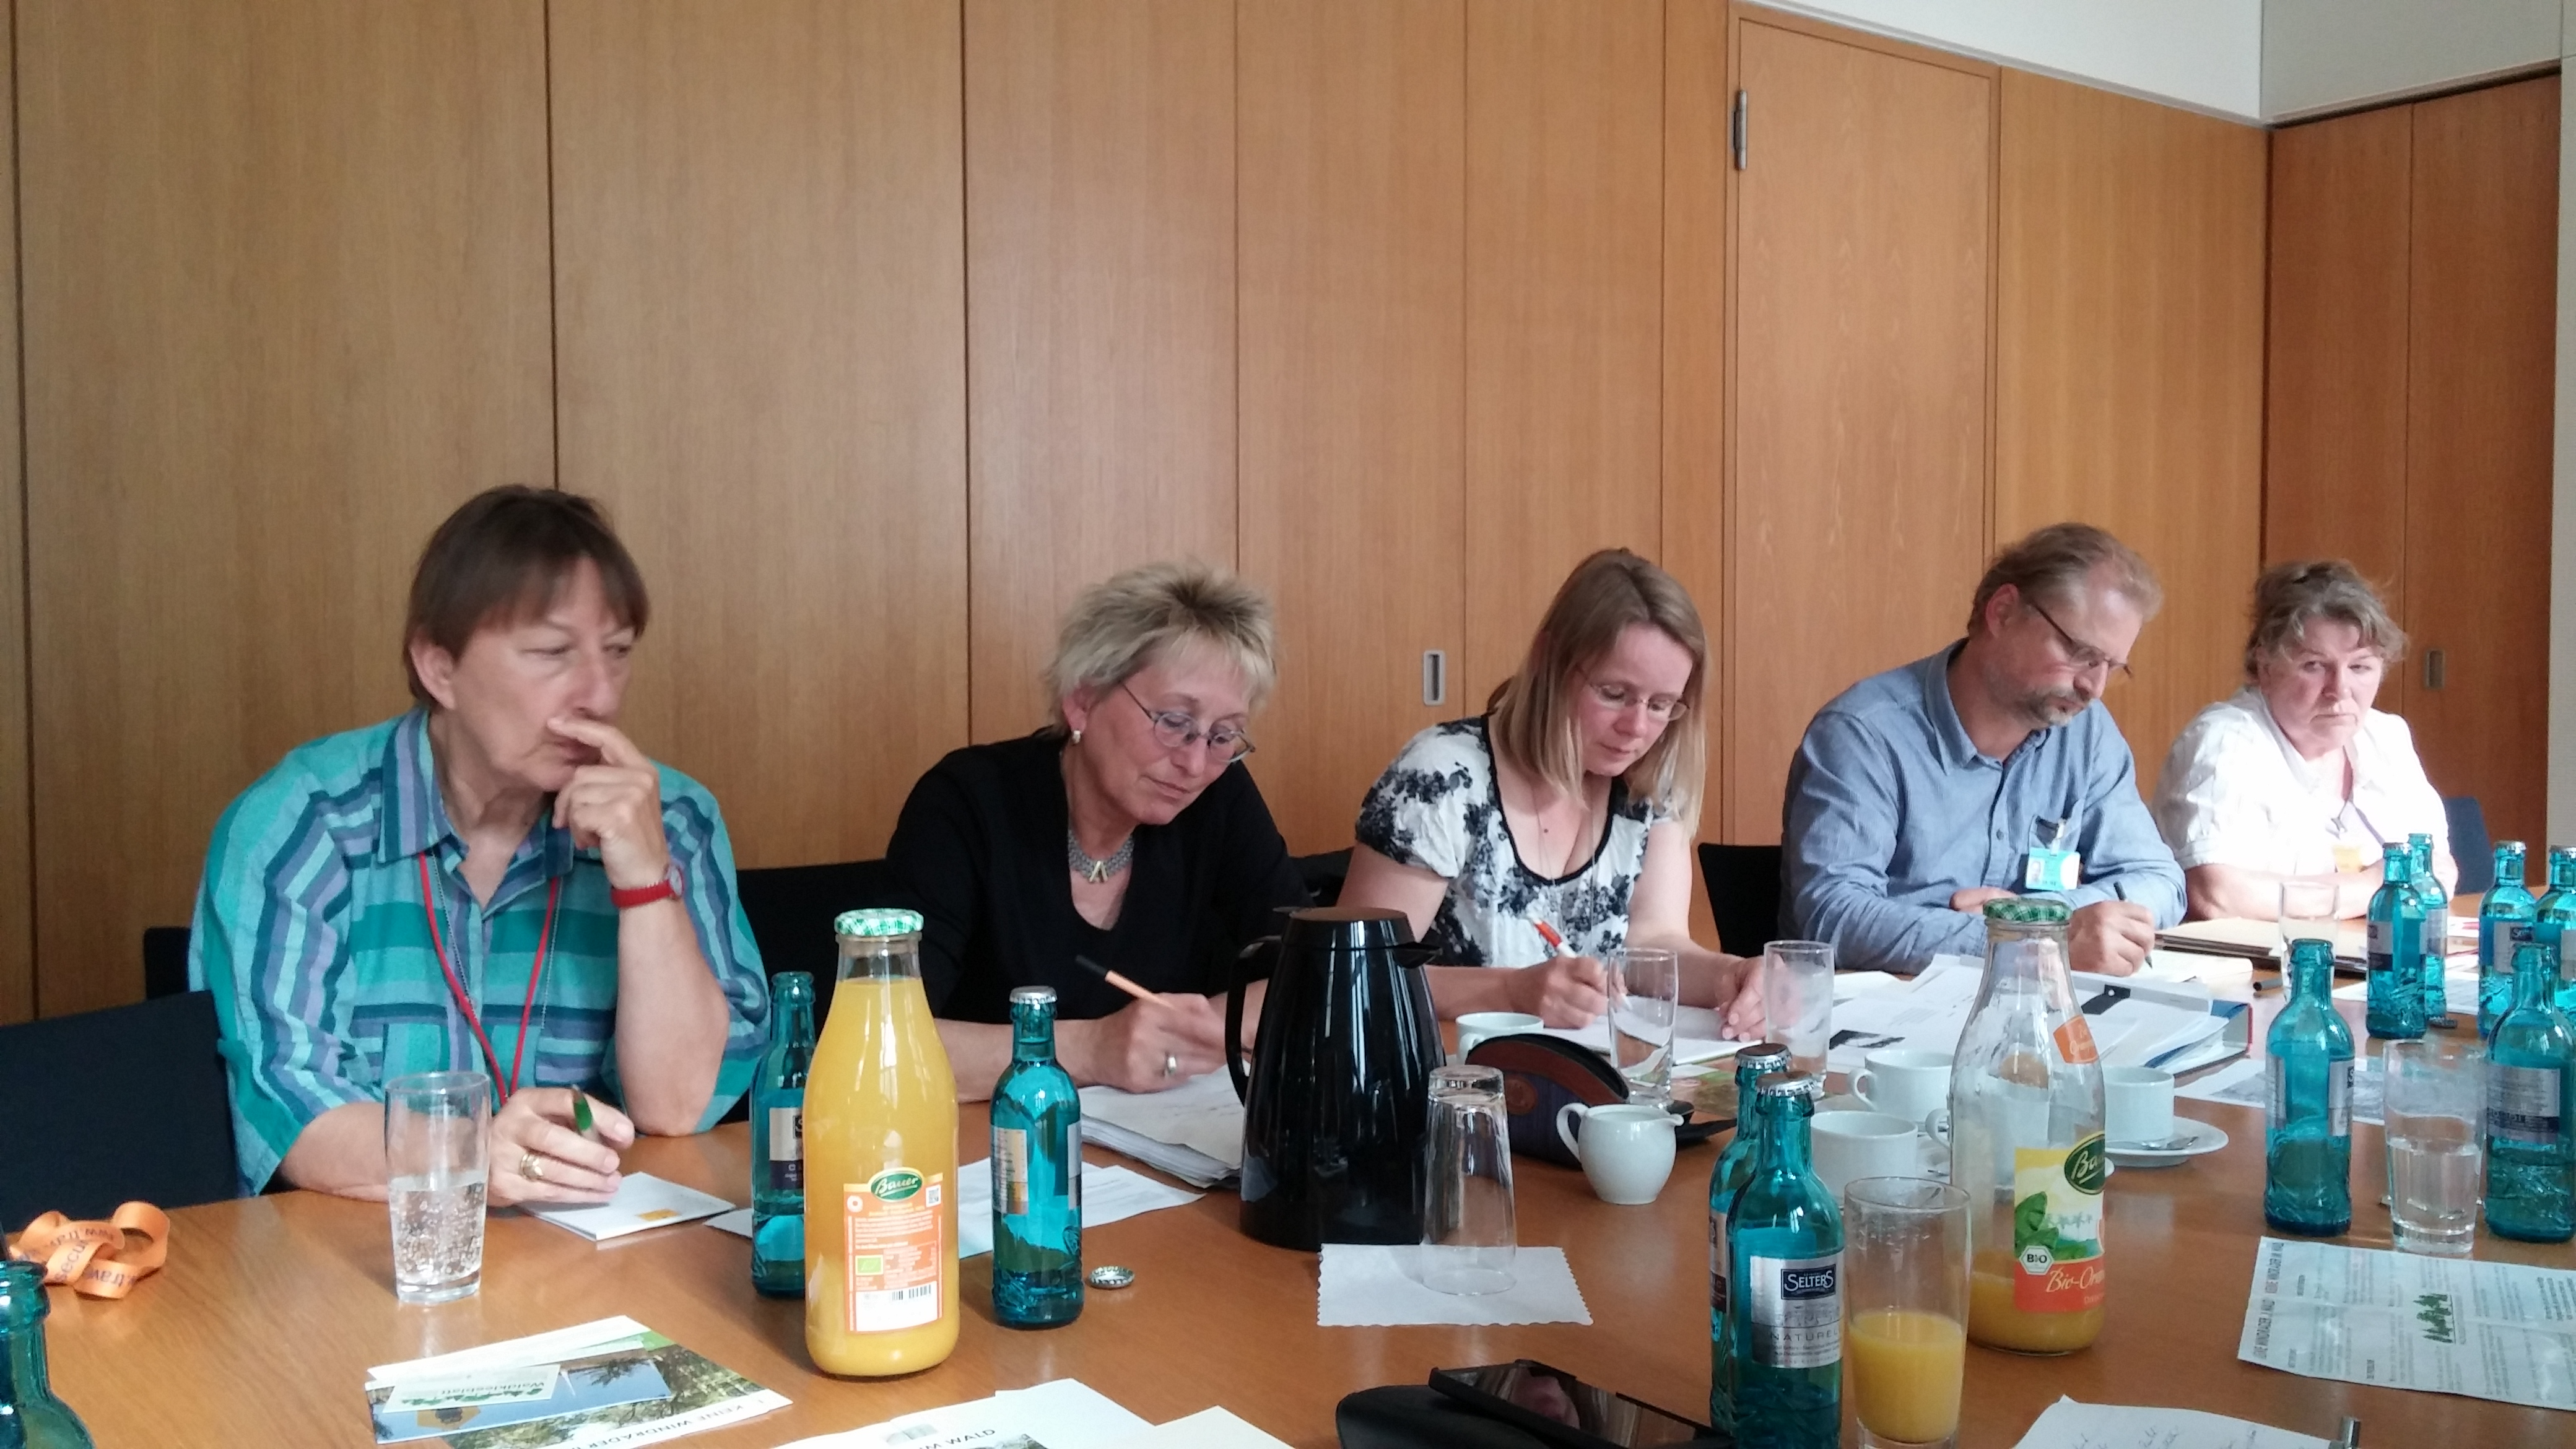 15-06-29 Bundestag 2